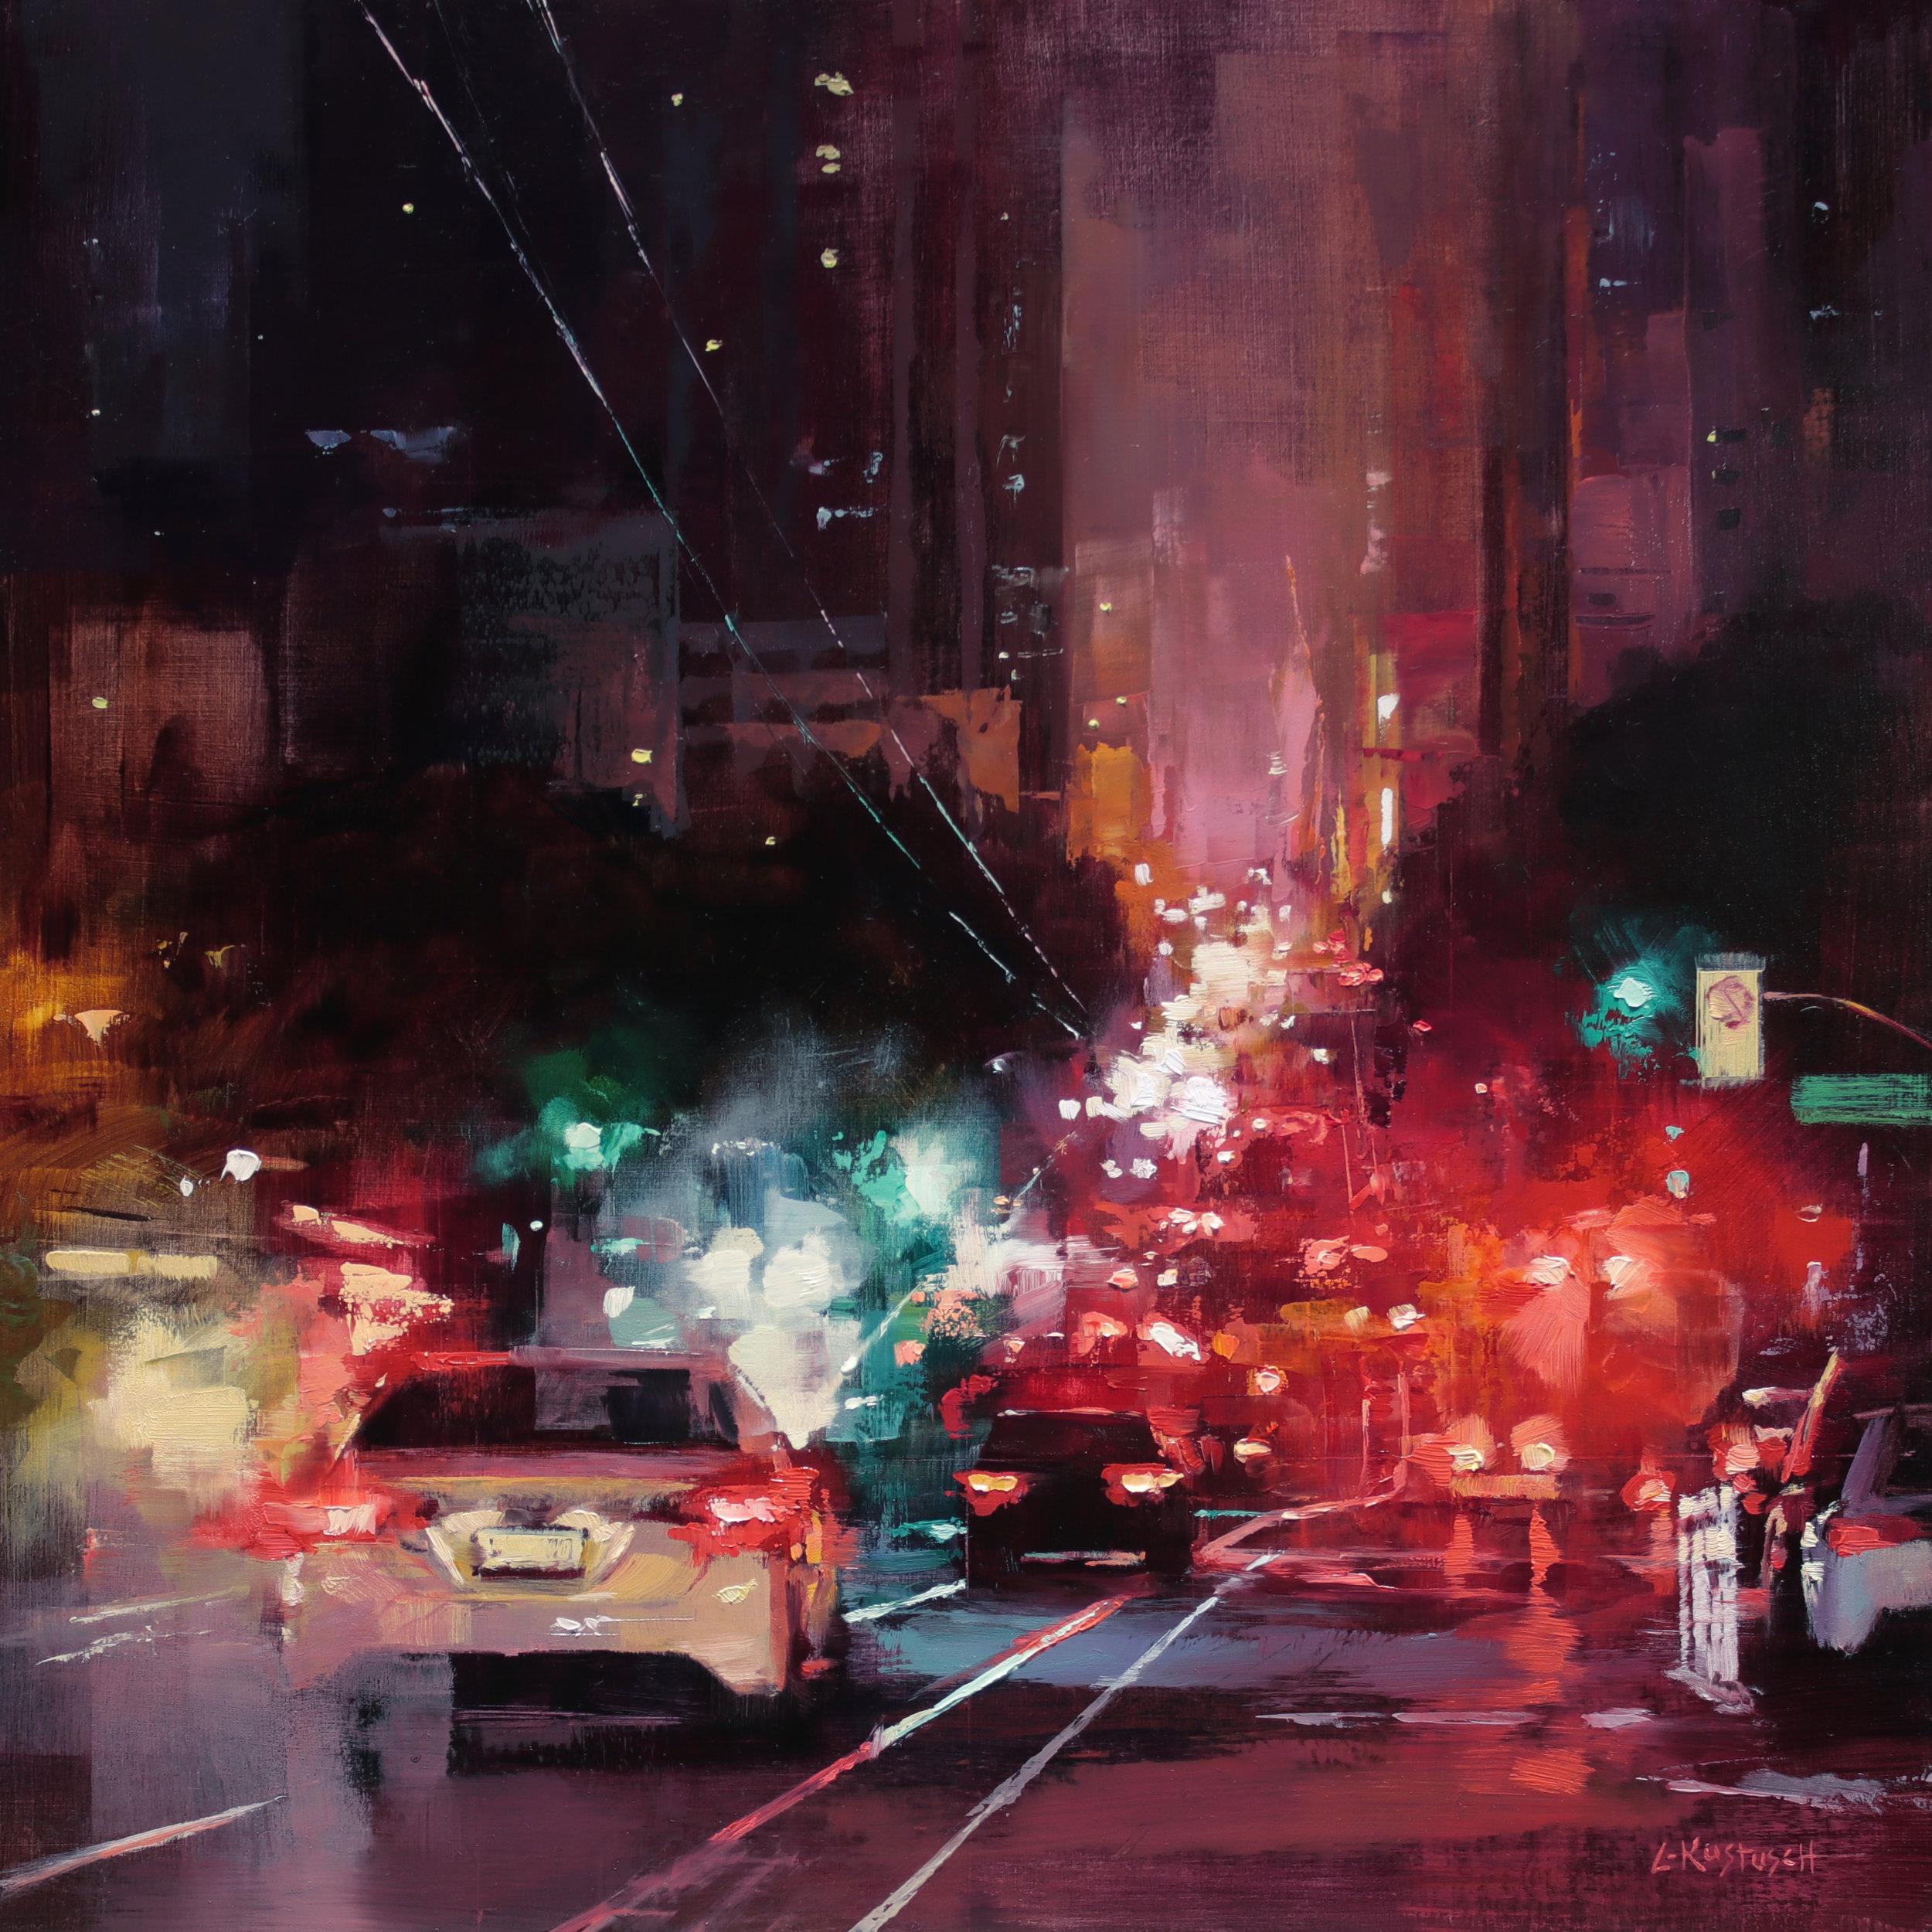 Lindsey Kustusch_%22In the Light of the Night%22_16%22x16%22_oil on panel_$2,800.jpg